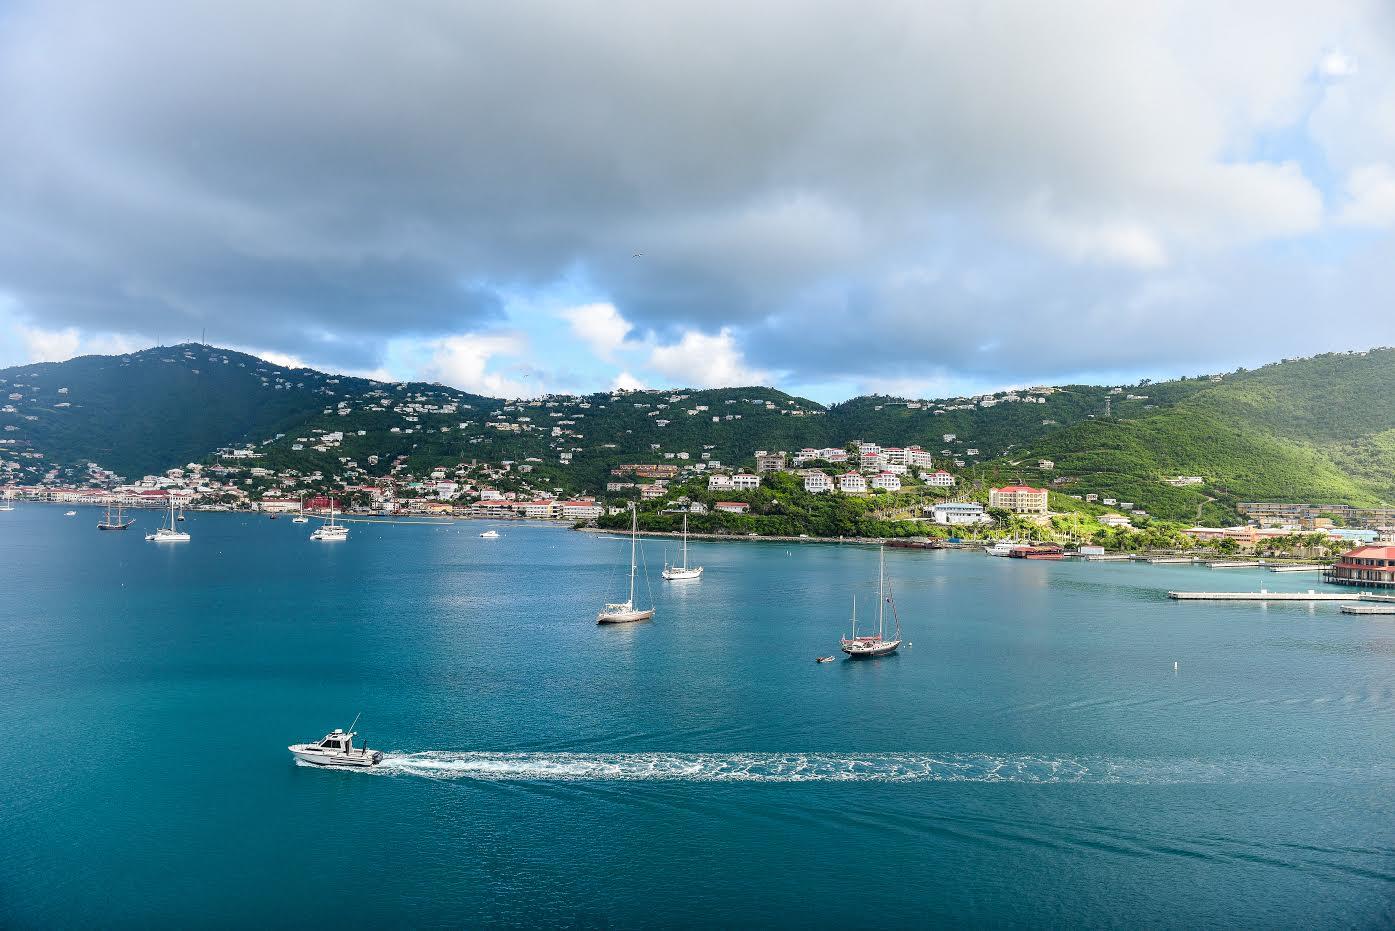 St Thomas, U.S. Virgin Islands